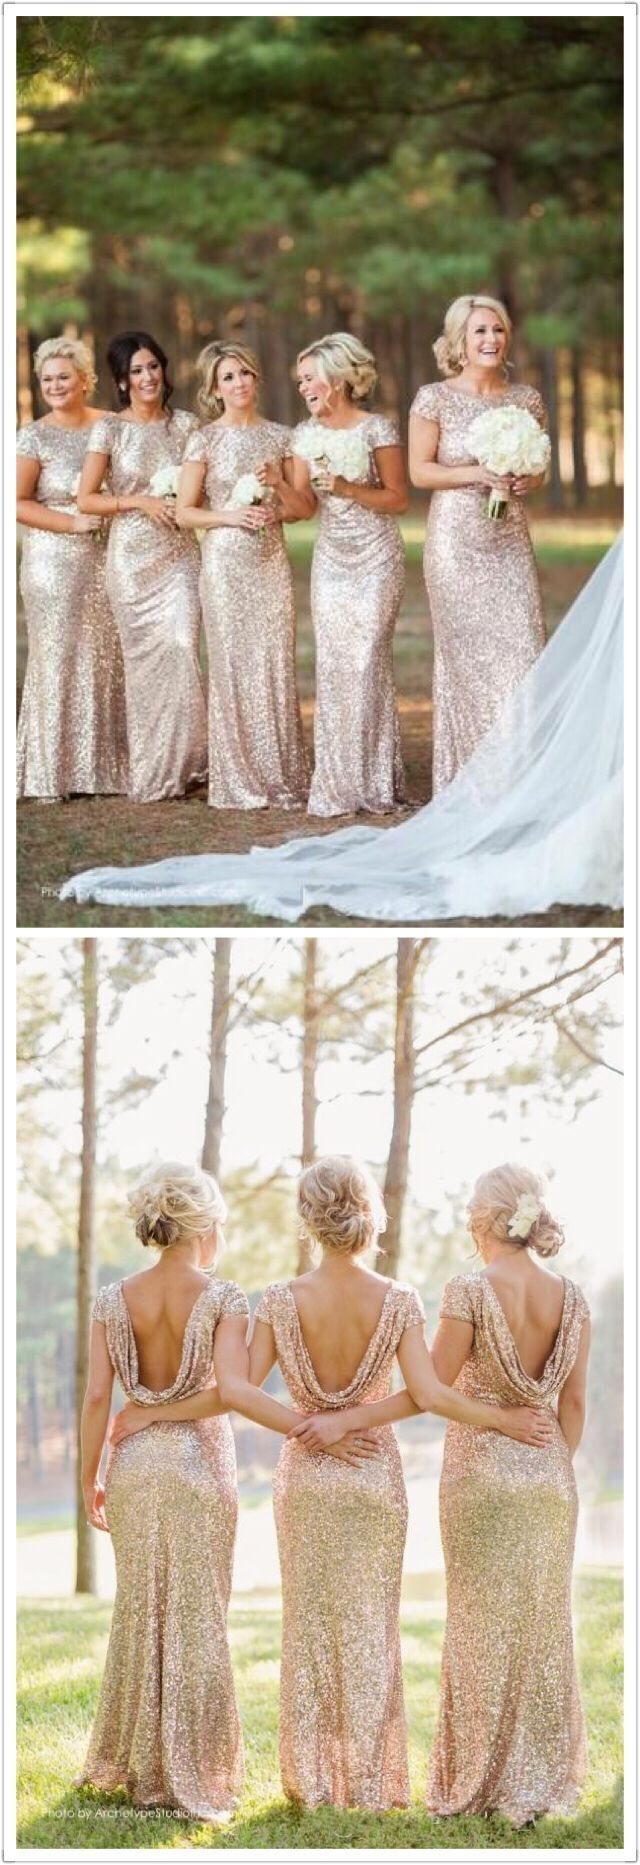 Gold Sequin bridesmaid dress,Custom Bridesmaid dress,High Neck bridesmaid dress,Short Sleeves bridesmaid dress,Open Back bridesmaid dress,Long Bridesmaid Dresses,